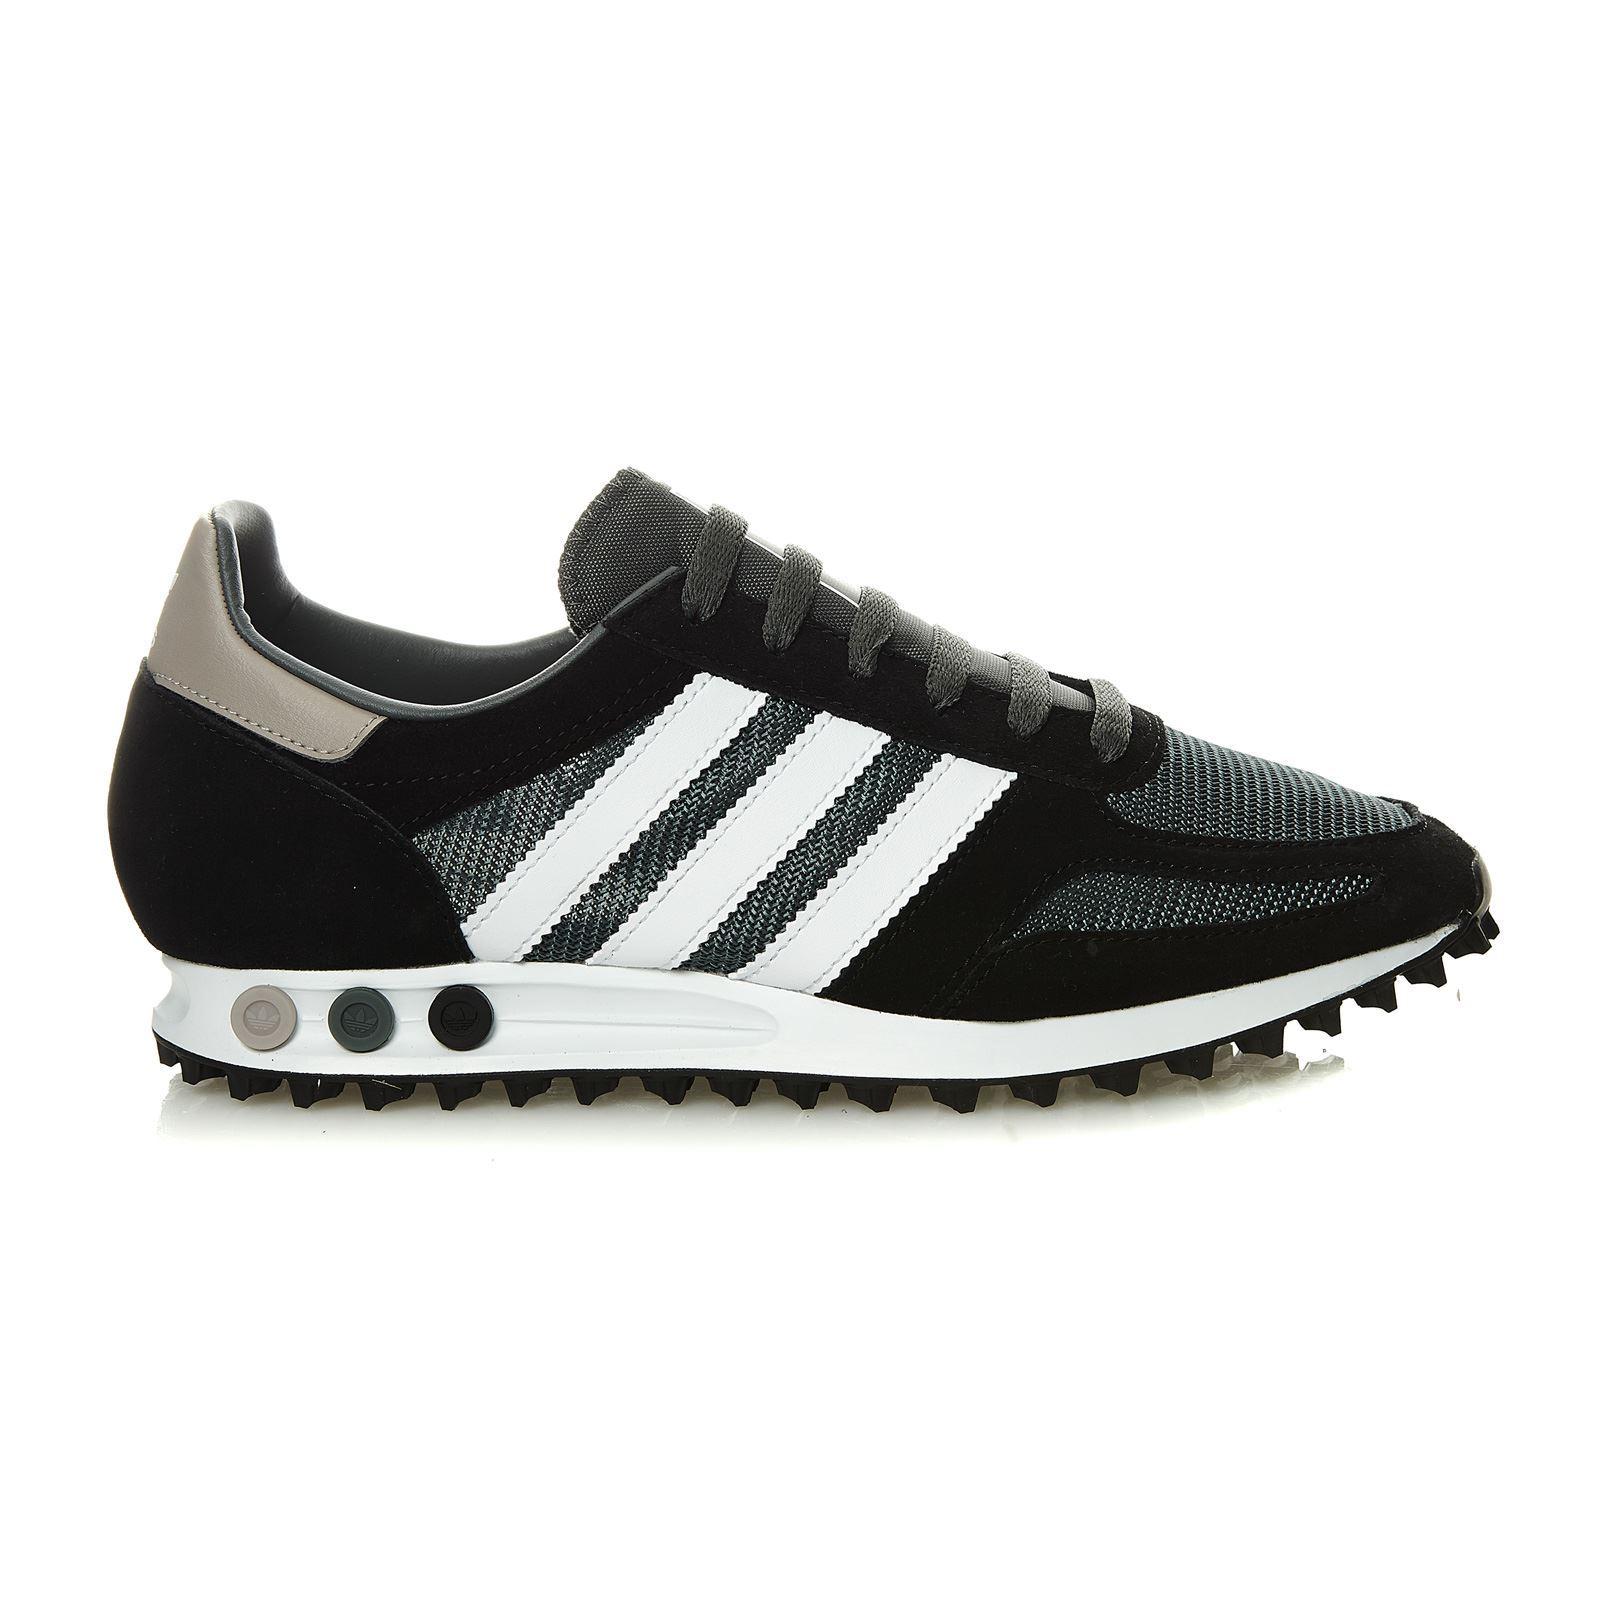 Femmes Trainers adidas Originals NULINE Trainers Noir